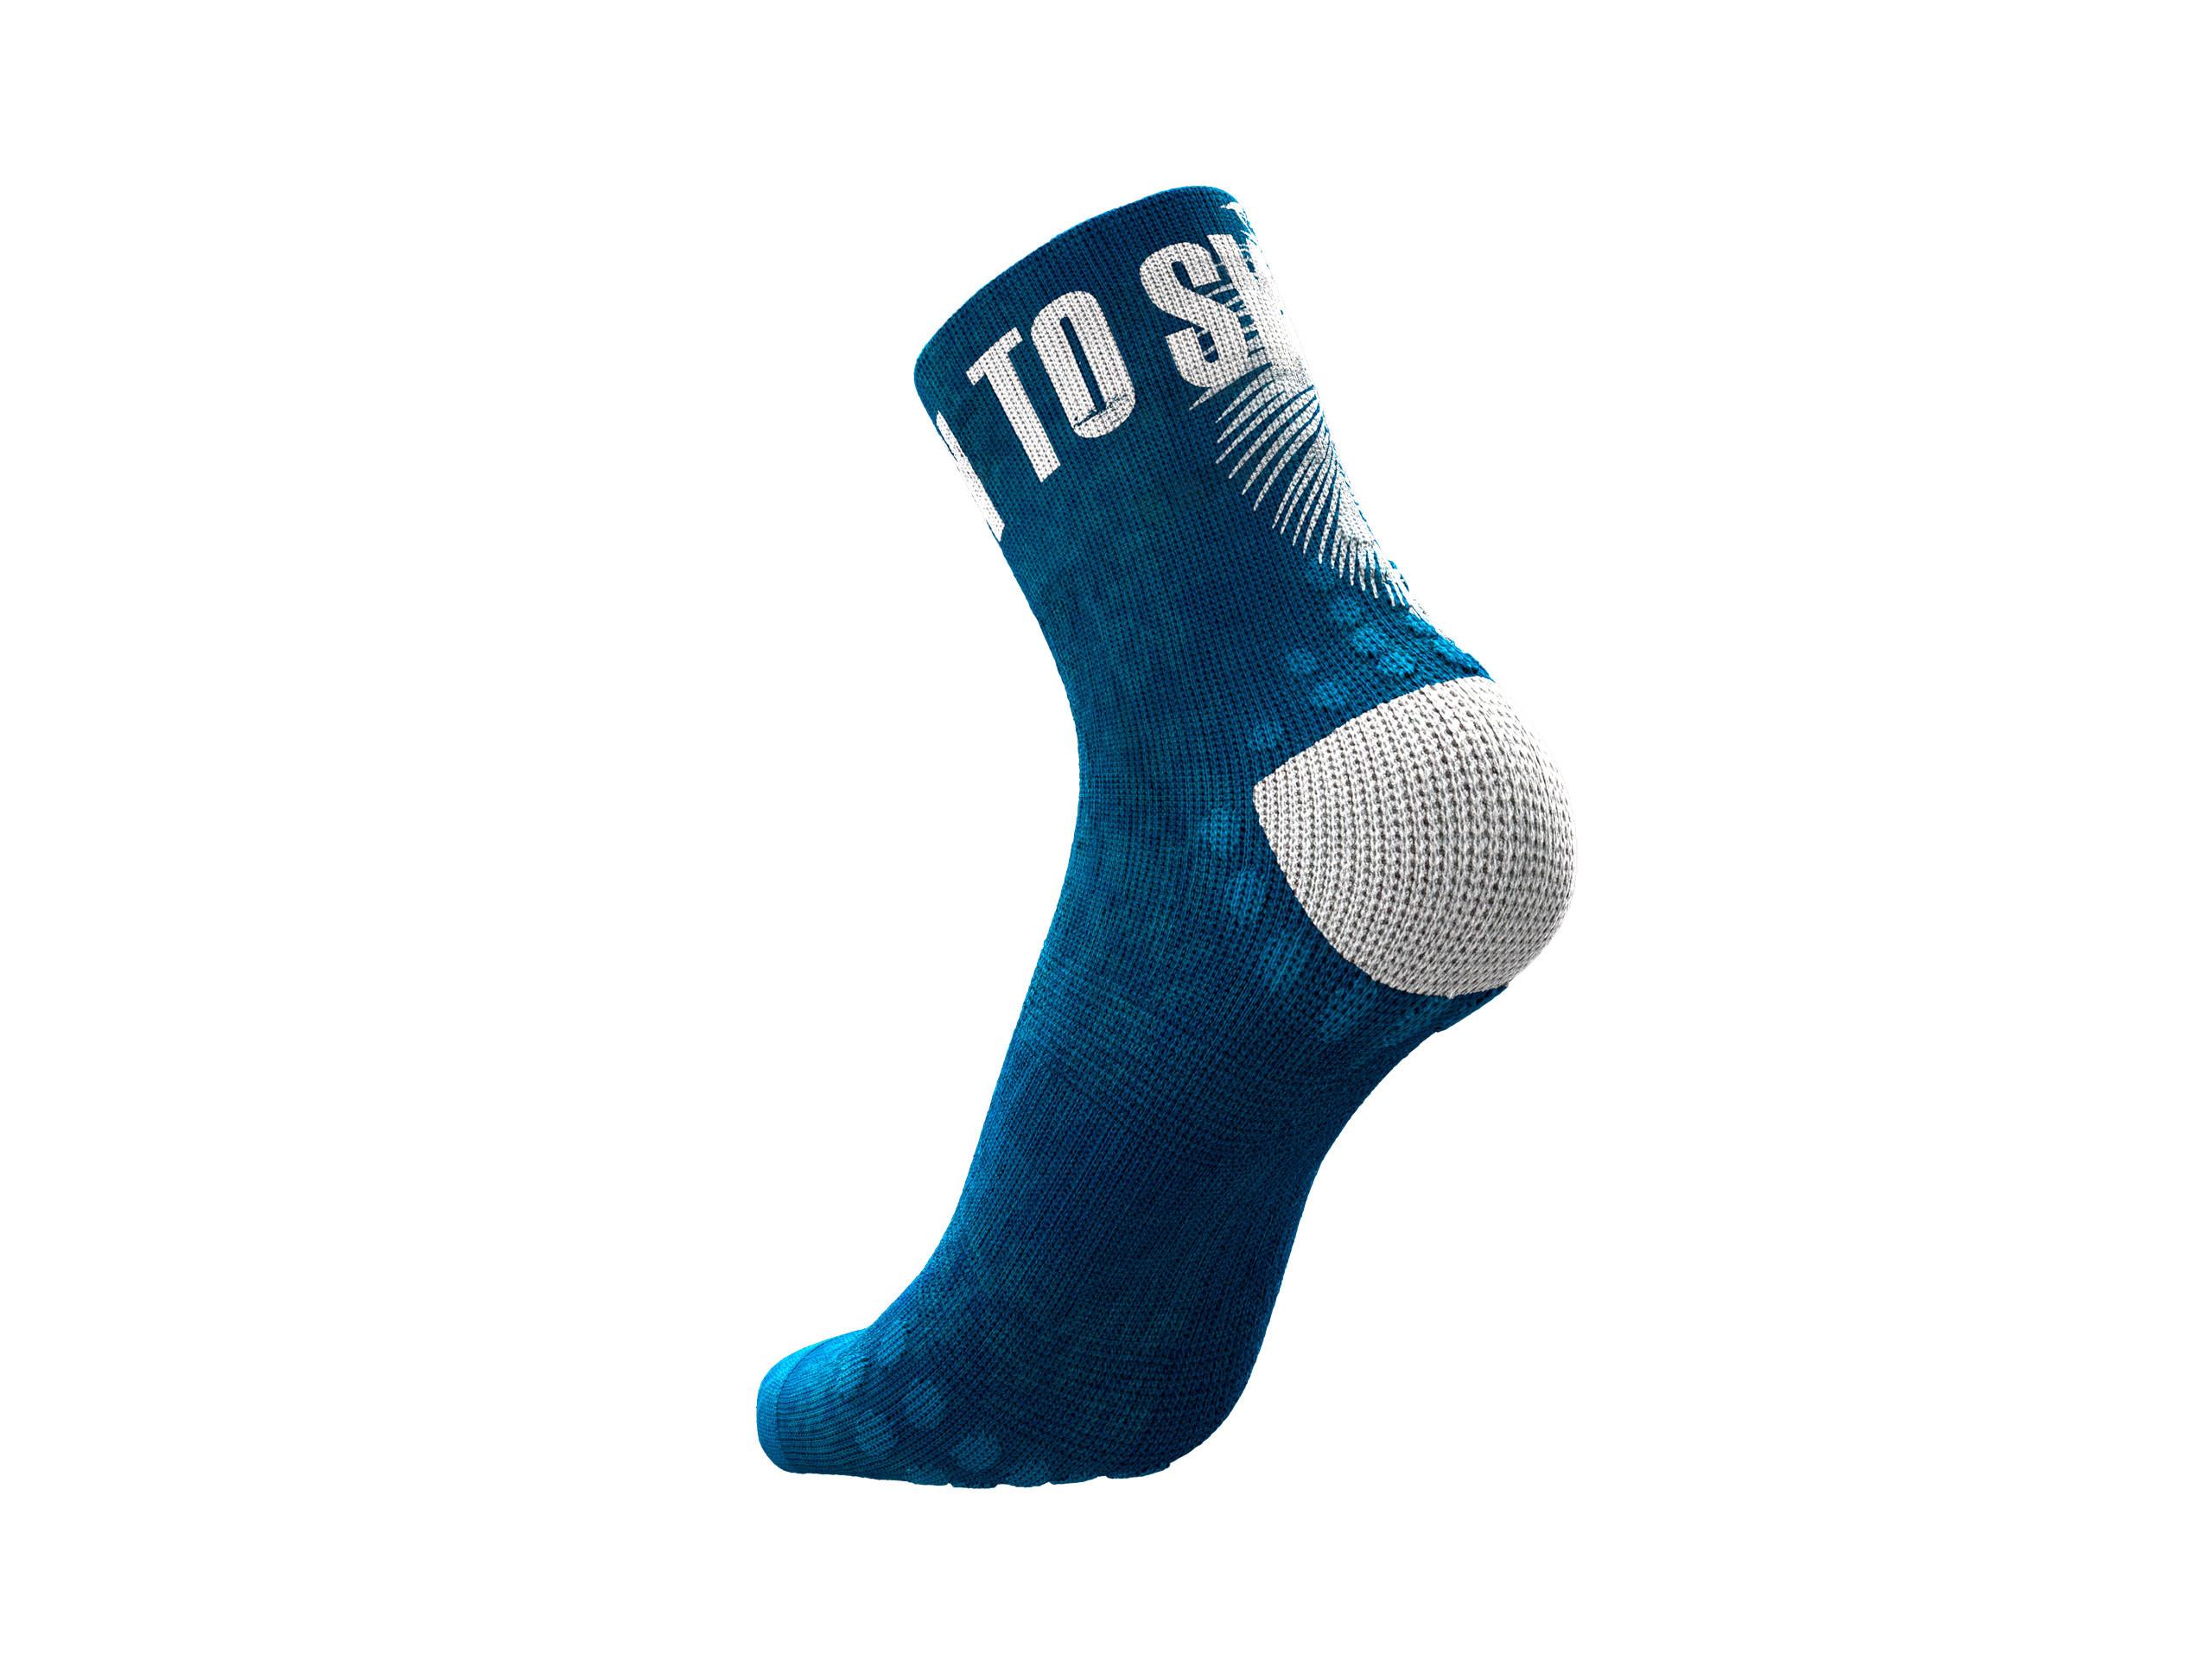 Pro Racing Socks v3.0 Ultralight Run High - Kona 2019 BLUE